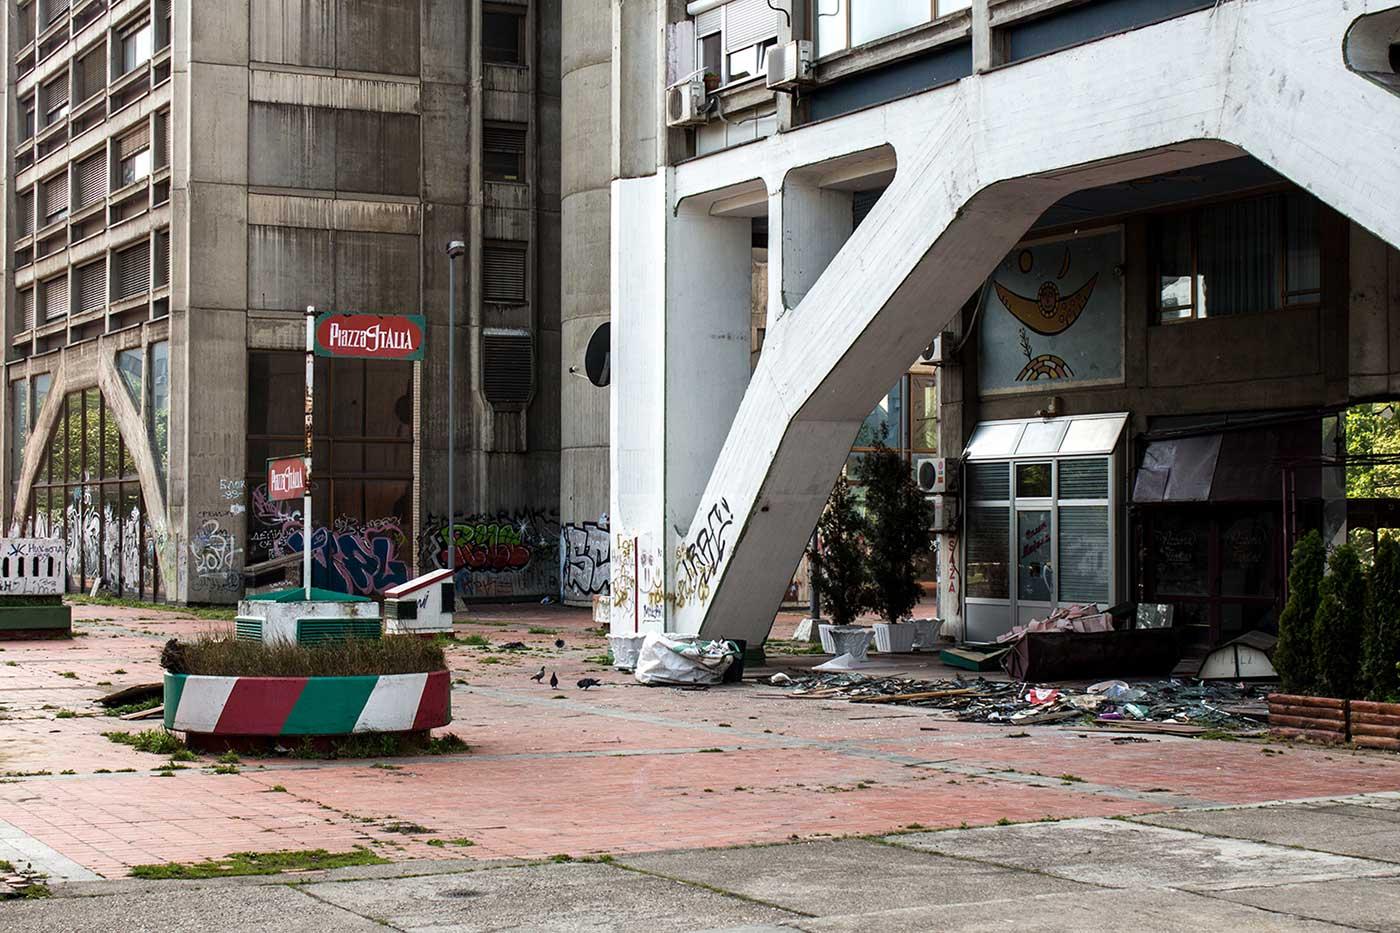 Broken tiles, litter and graffiti mar the plaza at ground level.